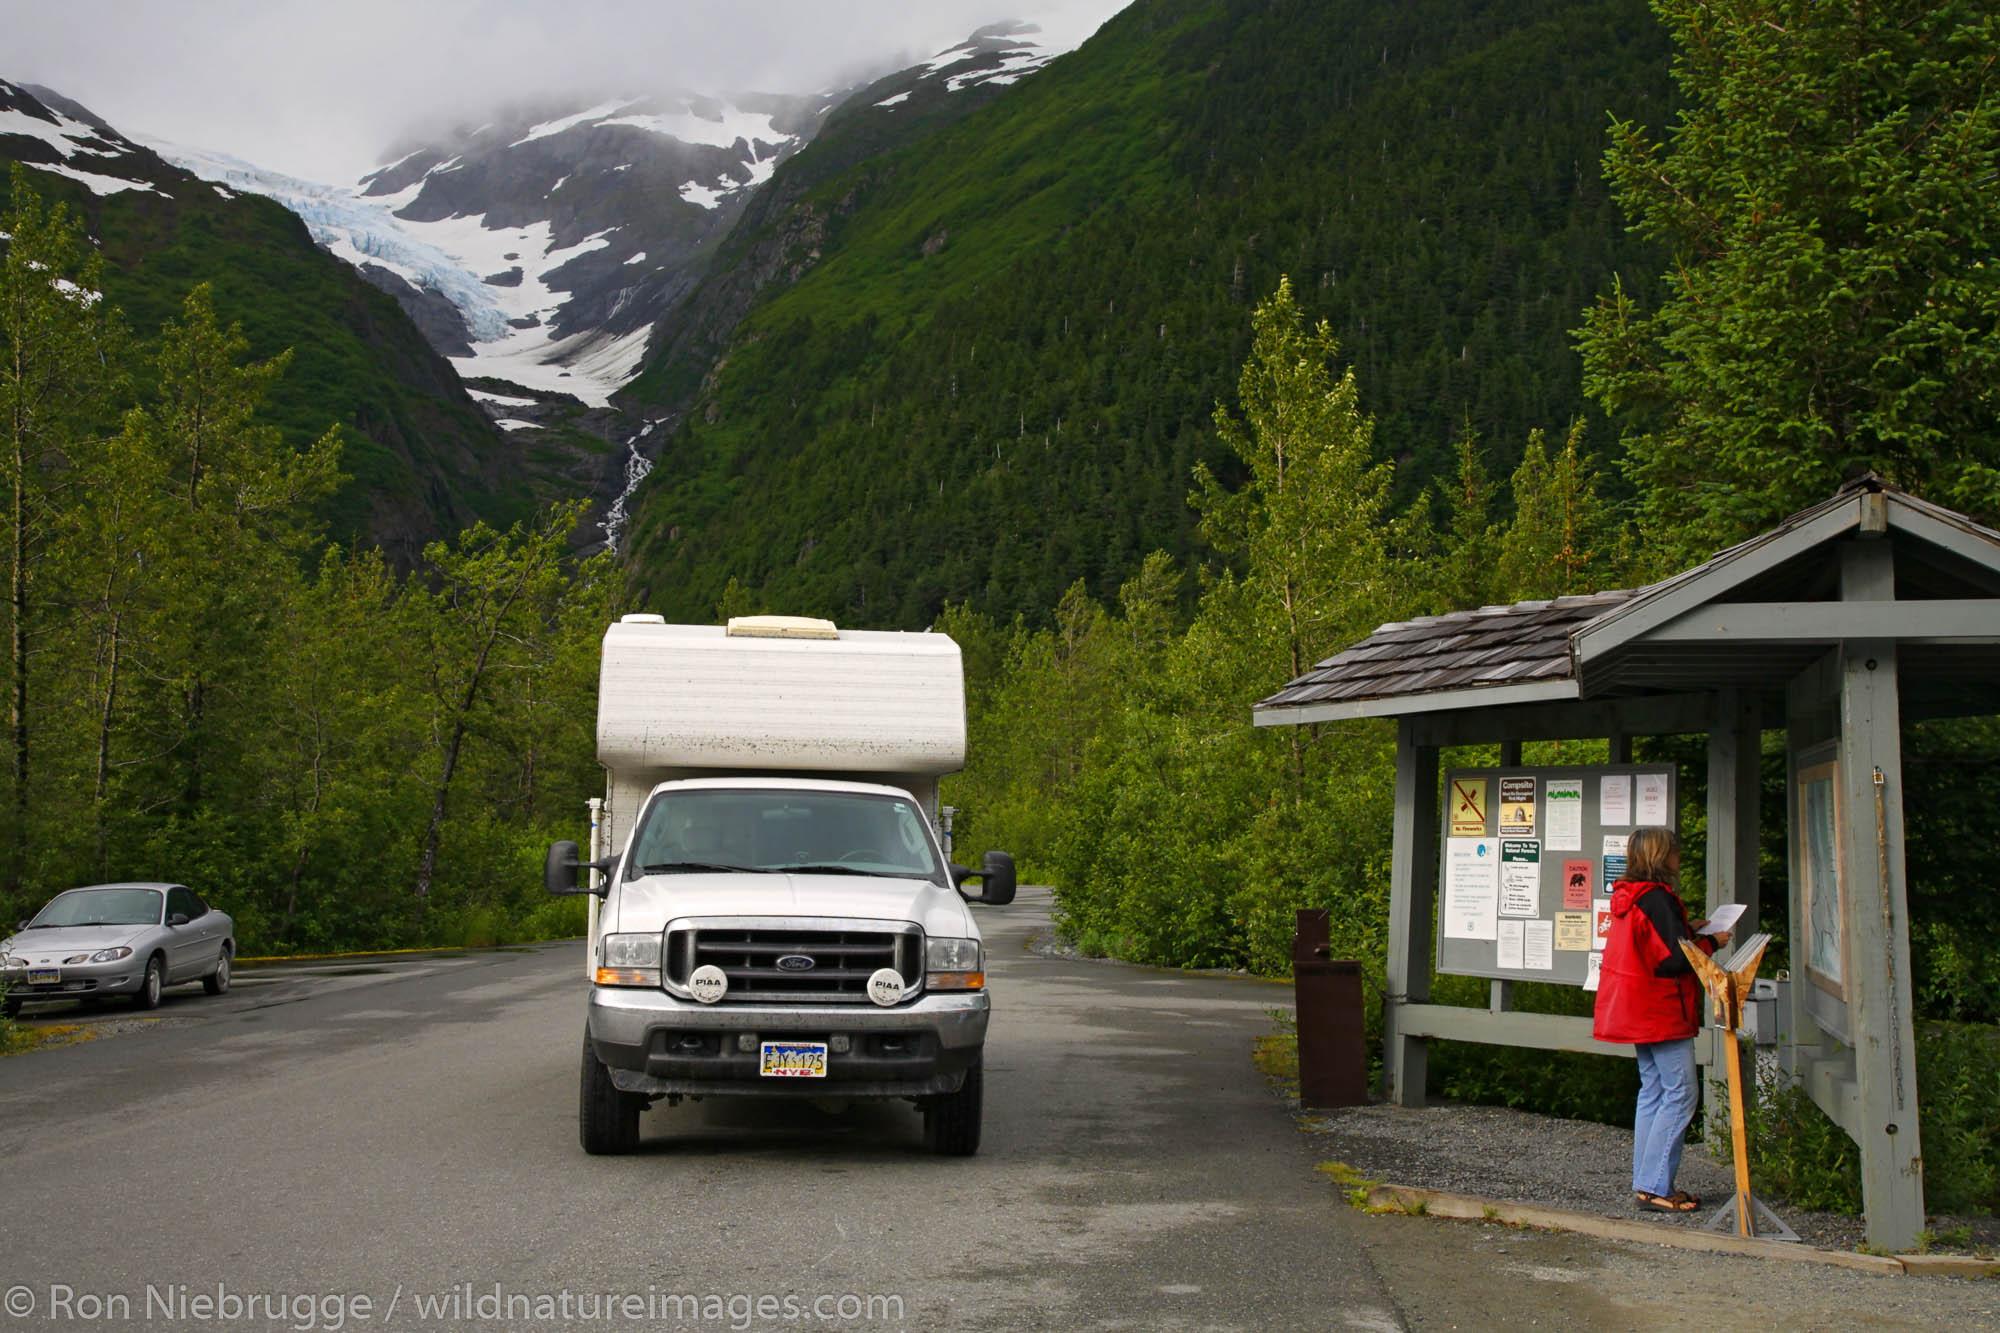 Williwaw Campground, Portage Valley, Chugach National Forest, Alaska.